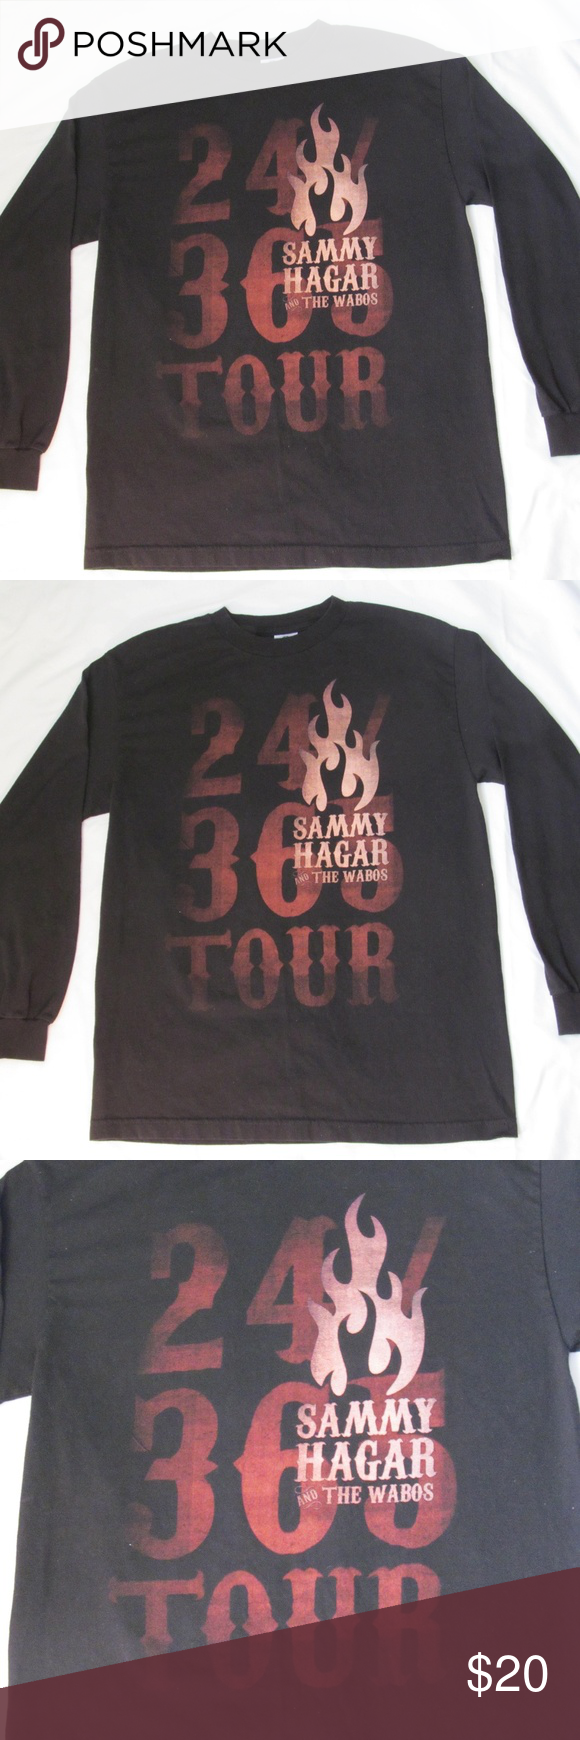 Sammy Hagar Red Rocker Wabos 24 365 Tour T Shirt Tour T Shirts Red Rocker Tour Shirt